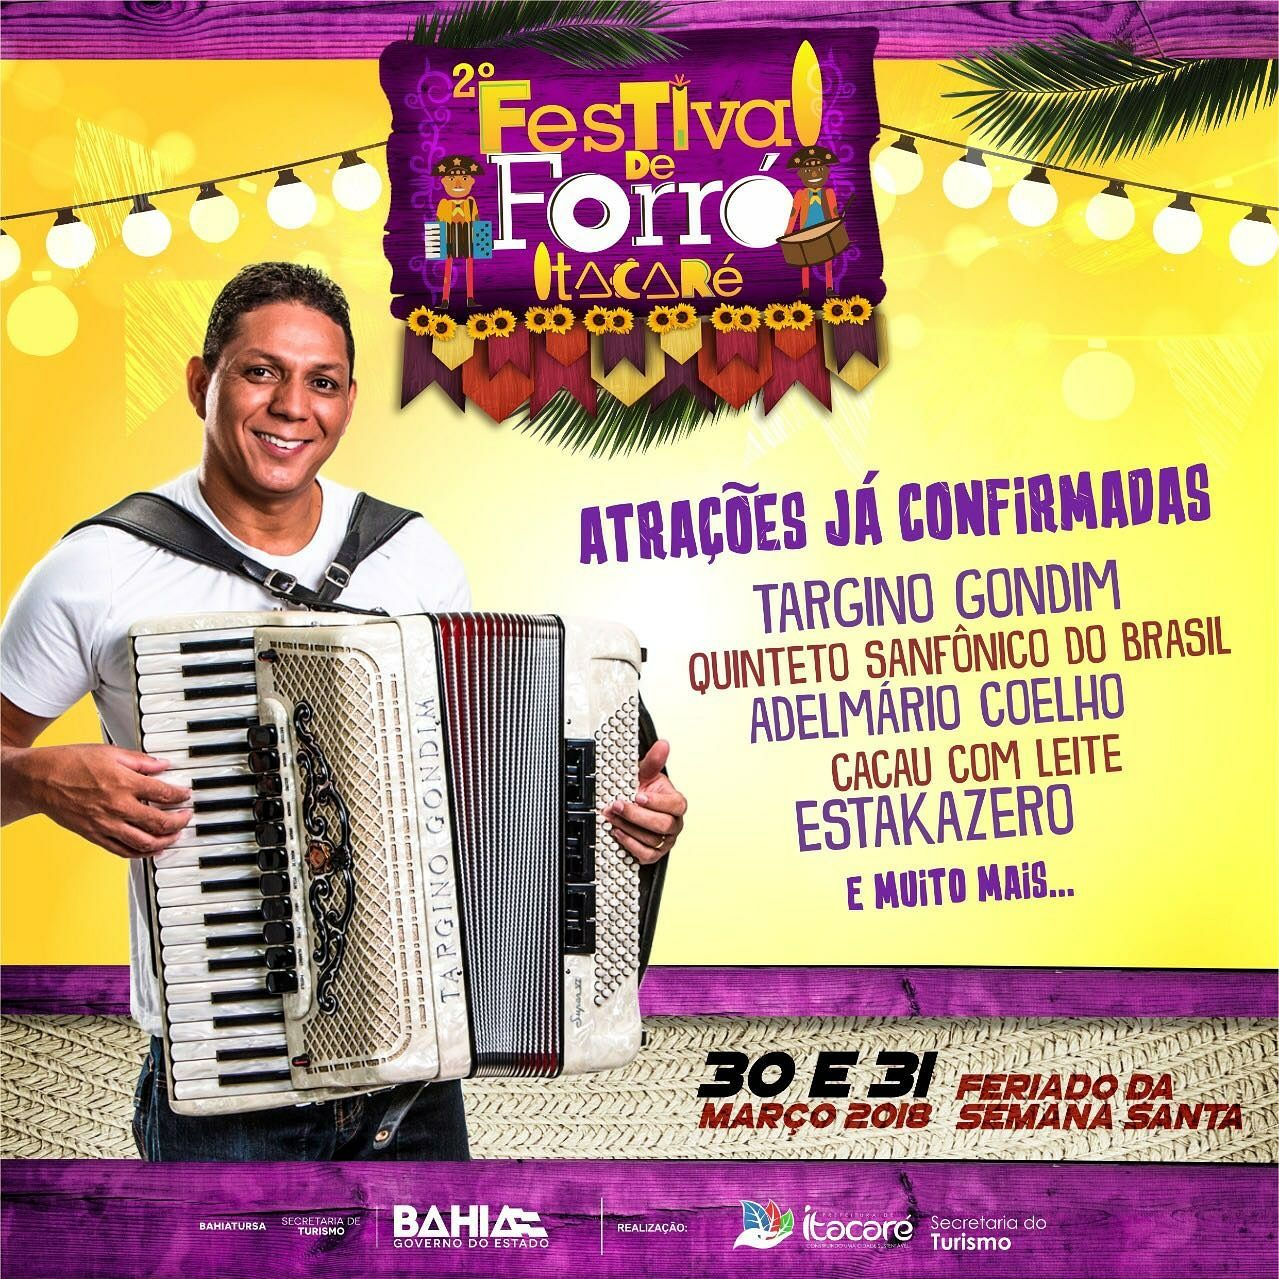 Festival de Forró em Itacaré!